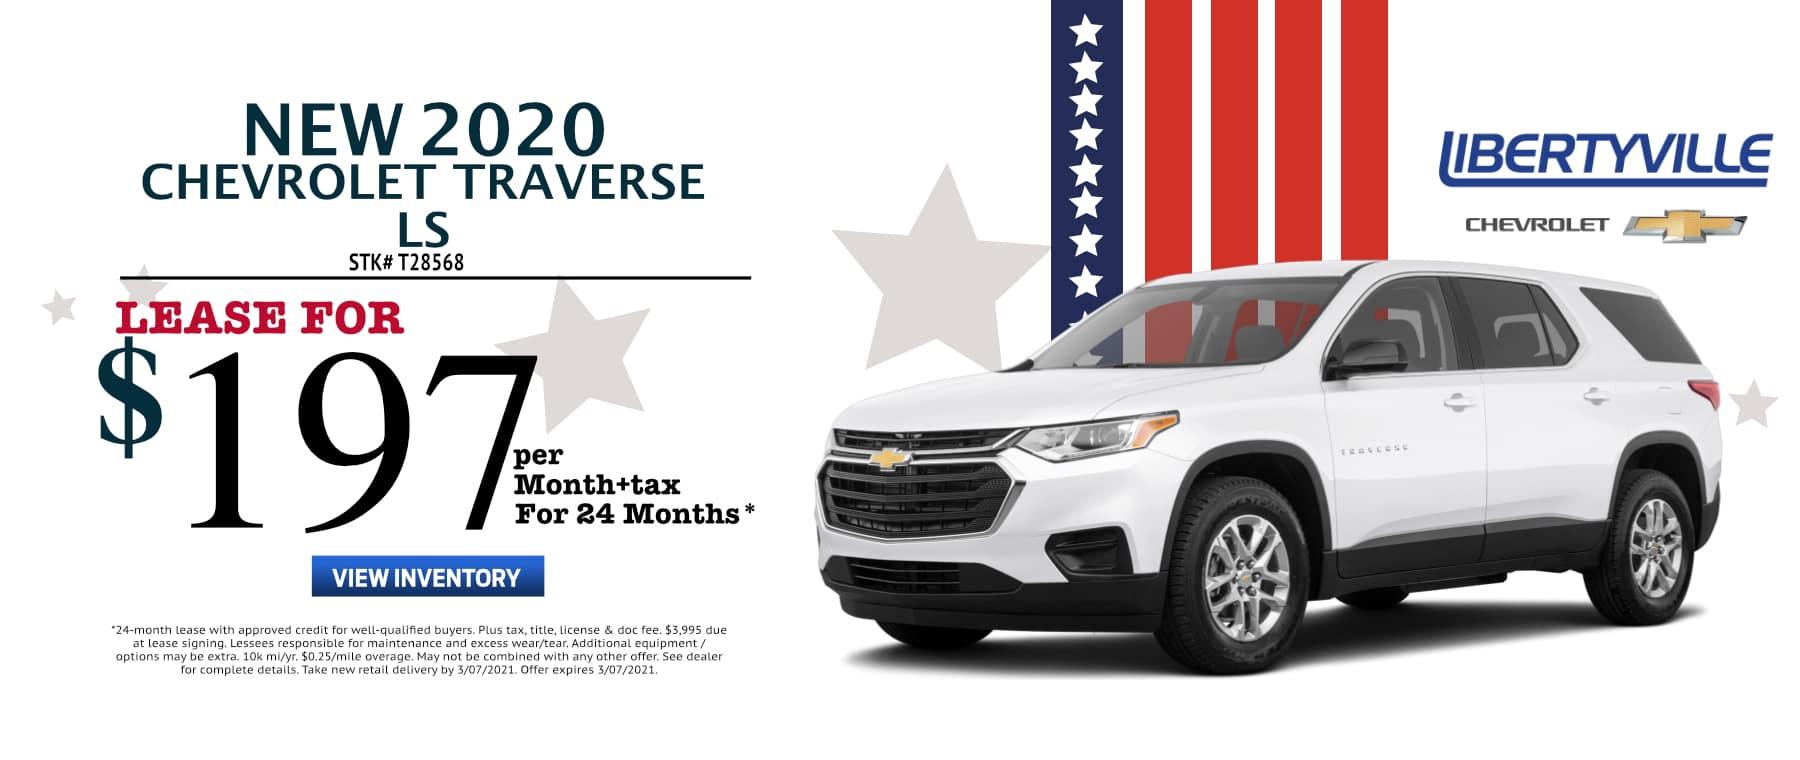 February_2021_Traverse_LEASE_Libertyville_Chevrolet